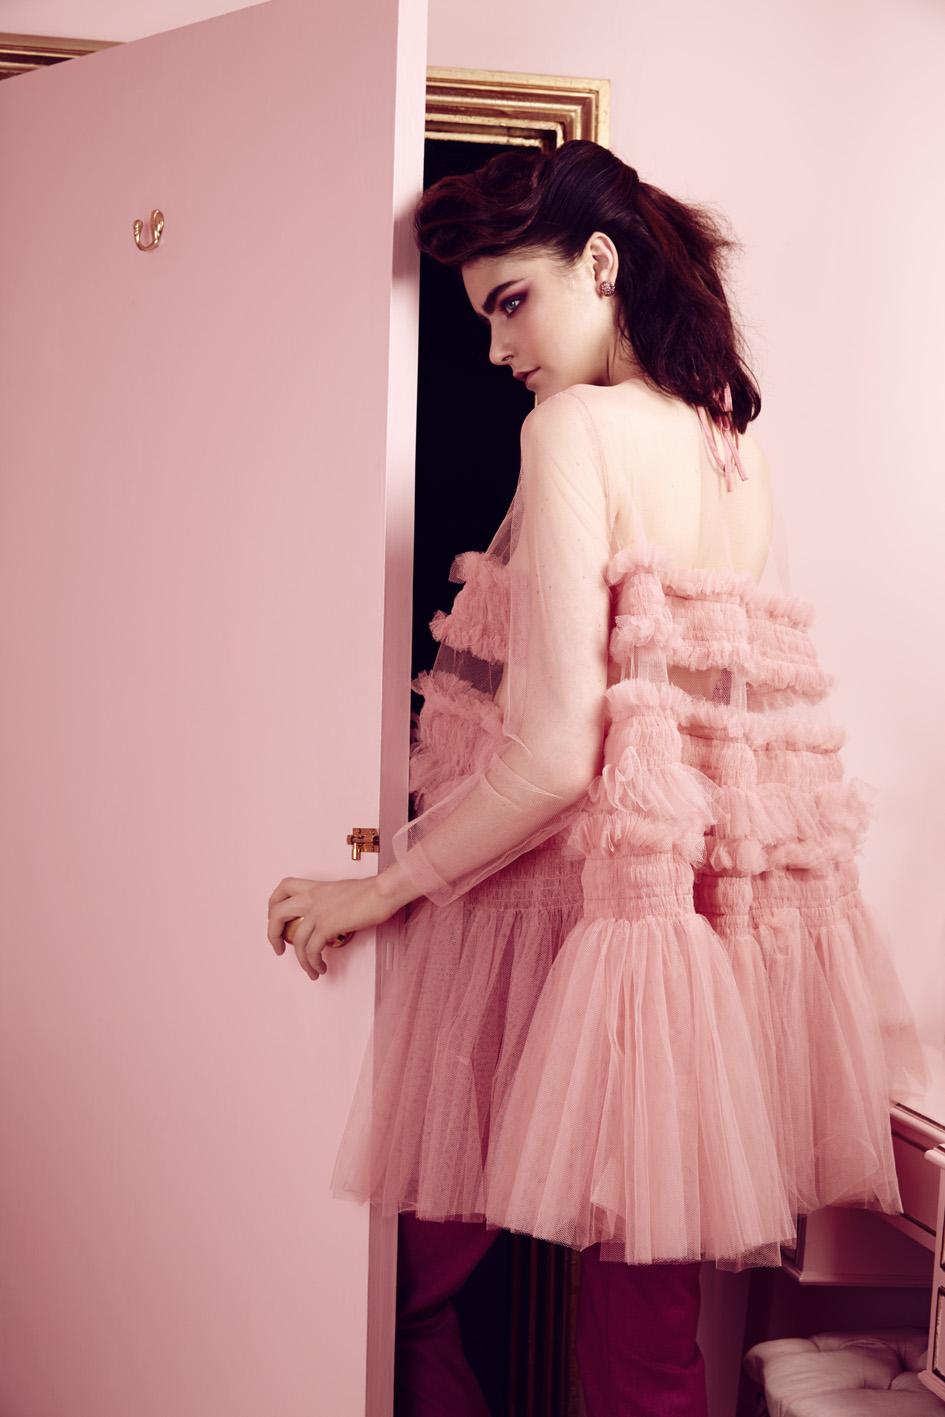 julia_kennedy_daphne_velghe_pink_house_03.jpg